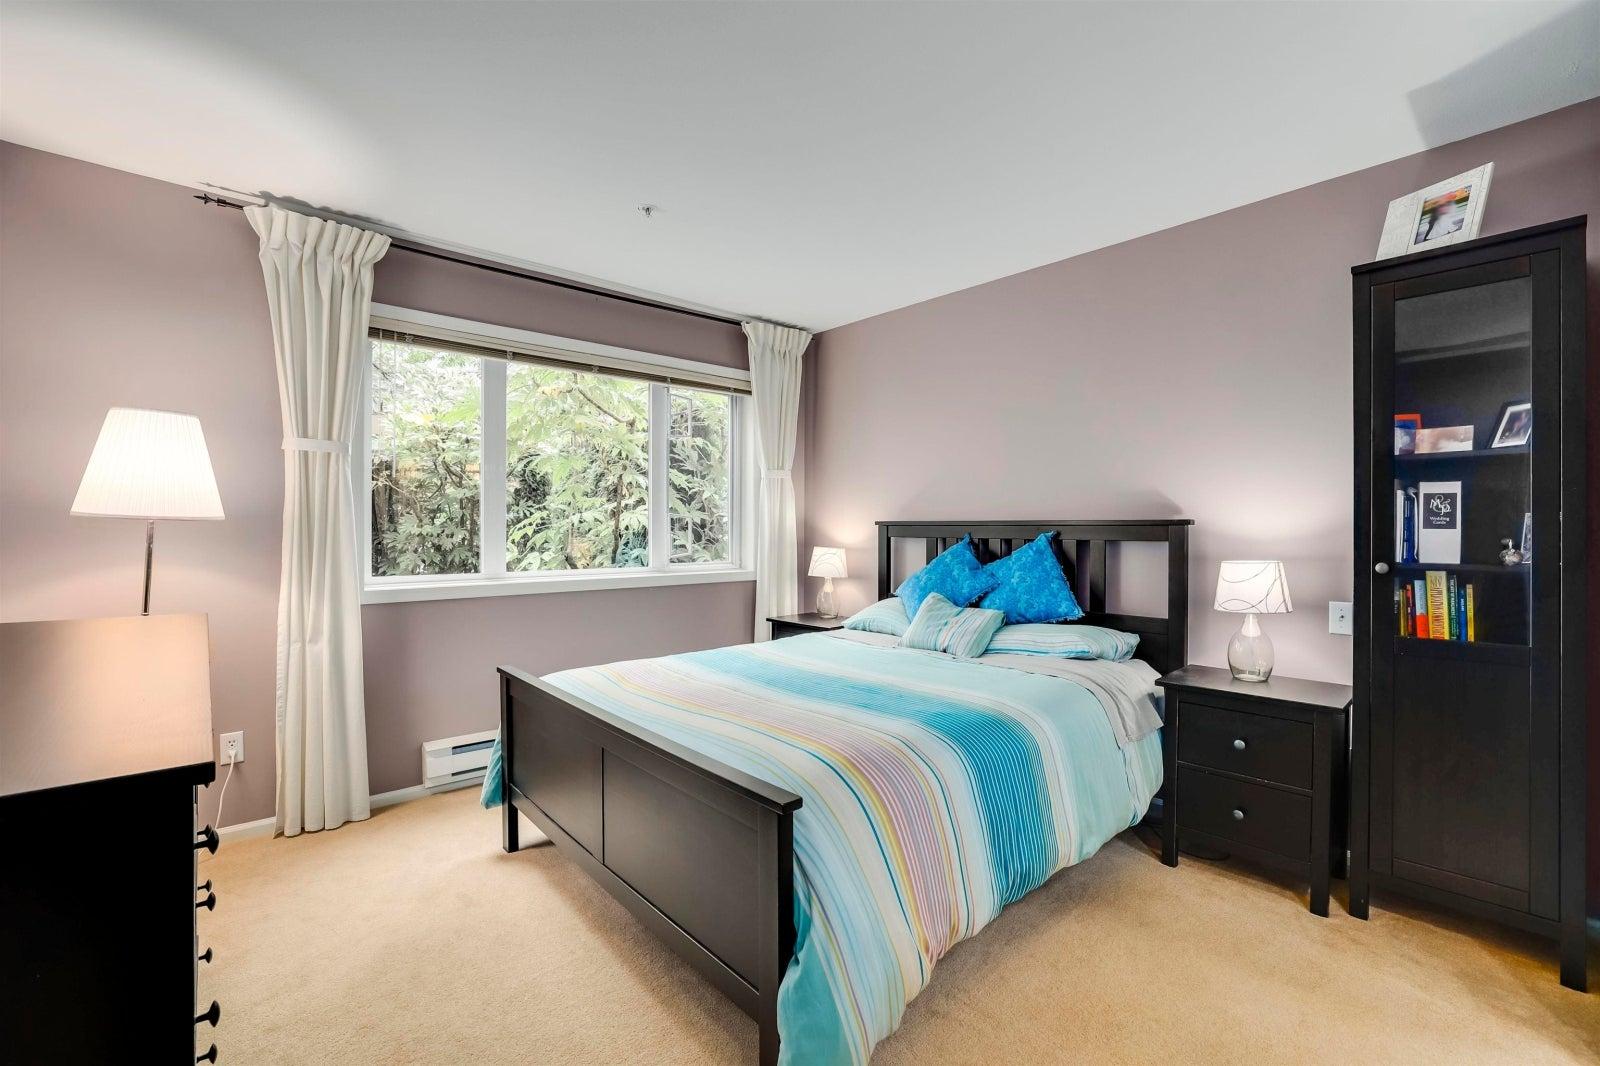 103 1132 DUFFERIN STREET - Eagle Ridge CQ Apartment/Condo for sale, 2 Bedrooms (R2618654) #15